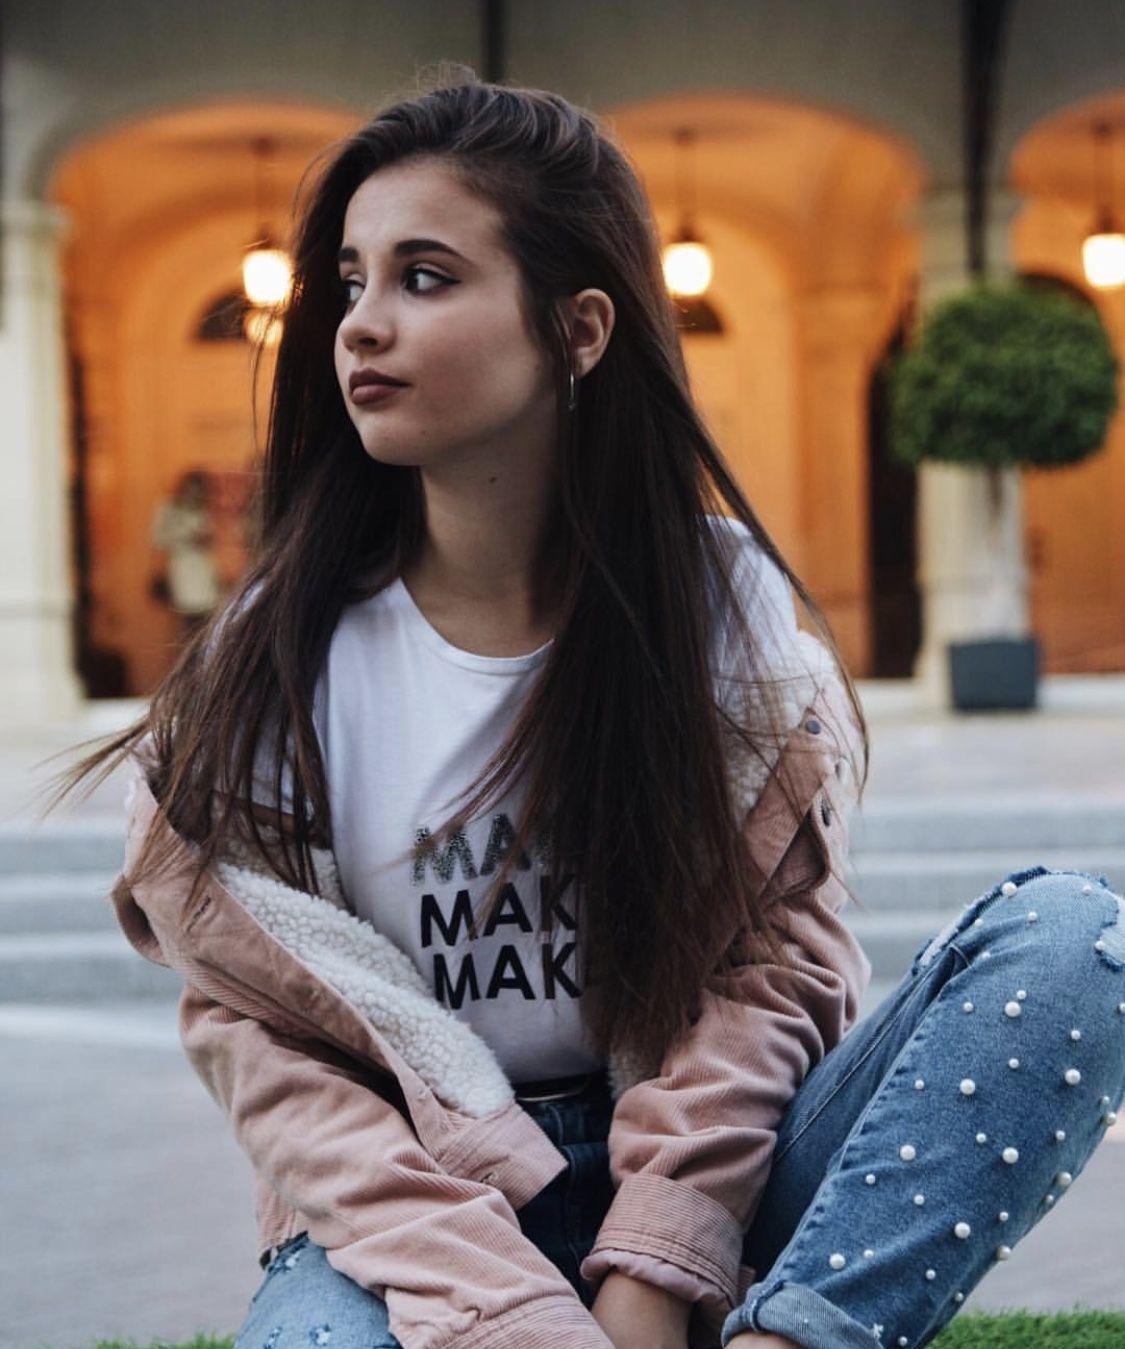 chica guapa 14 anos